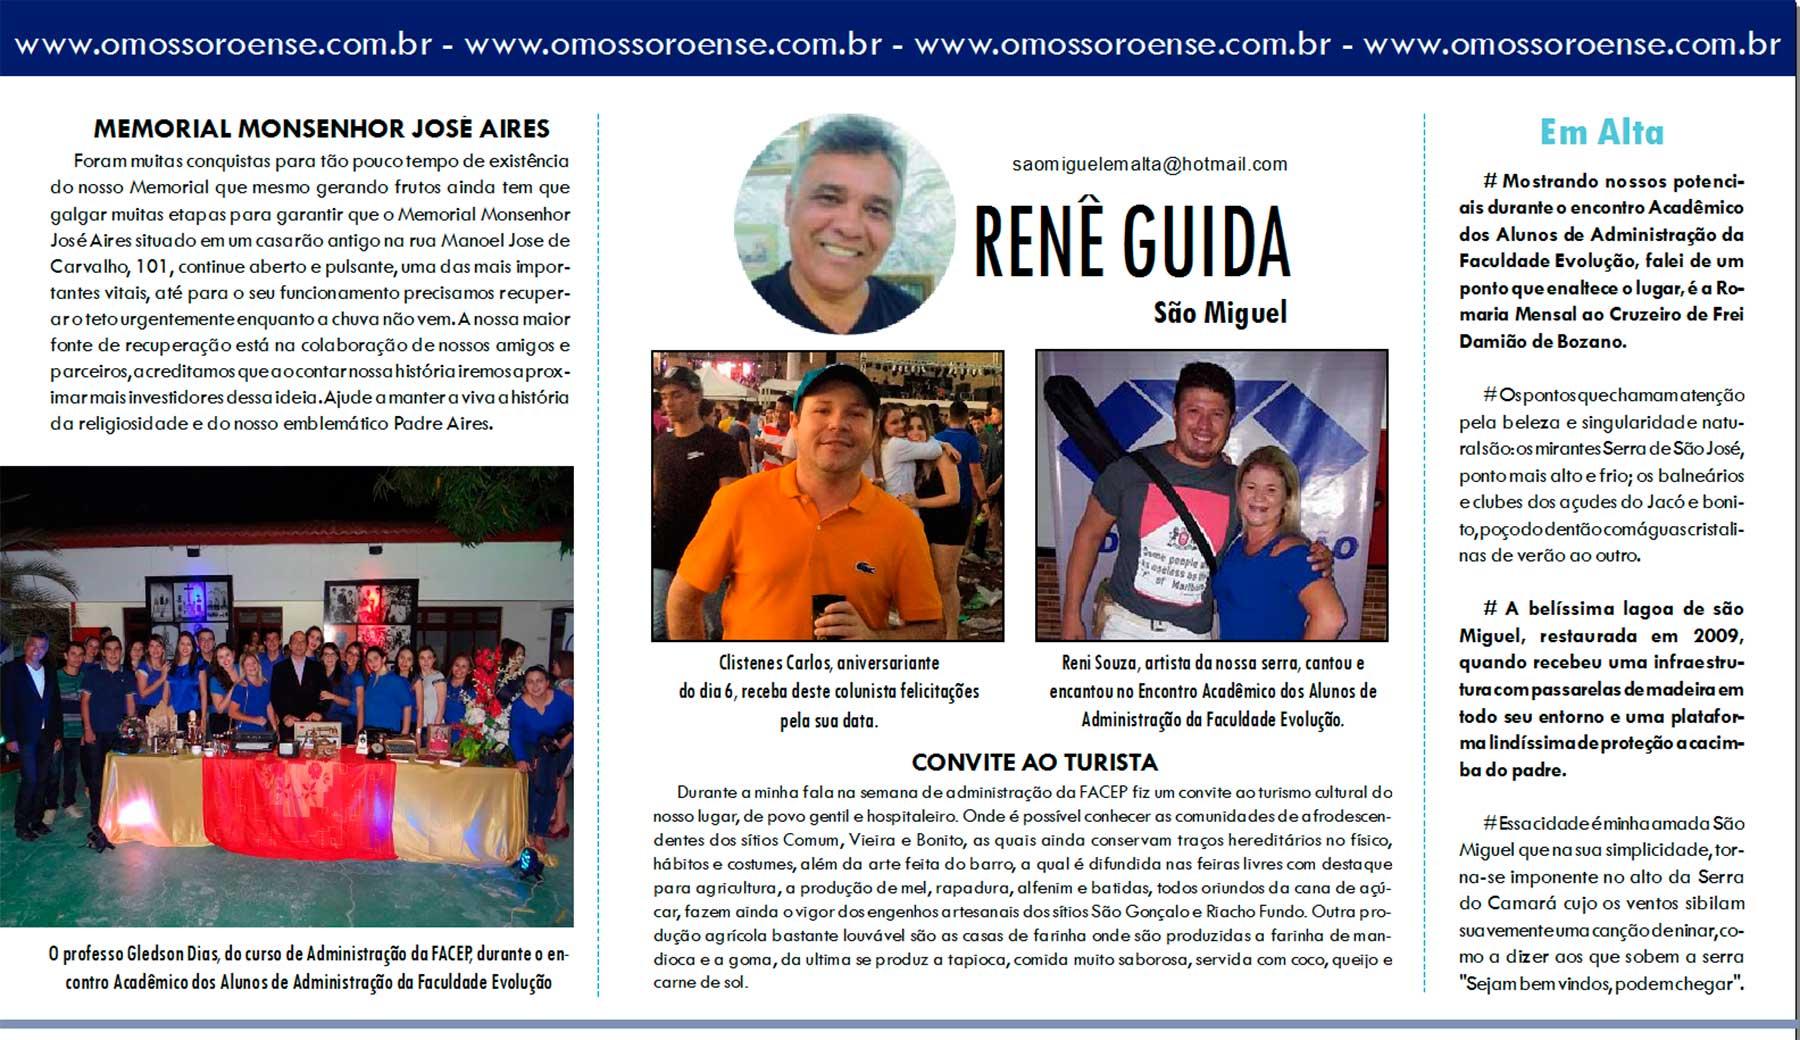 rene-guida-10-10-2016